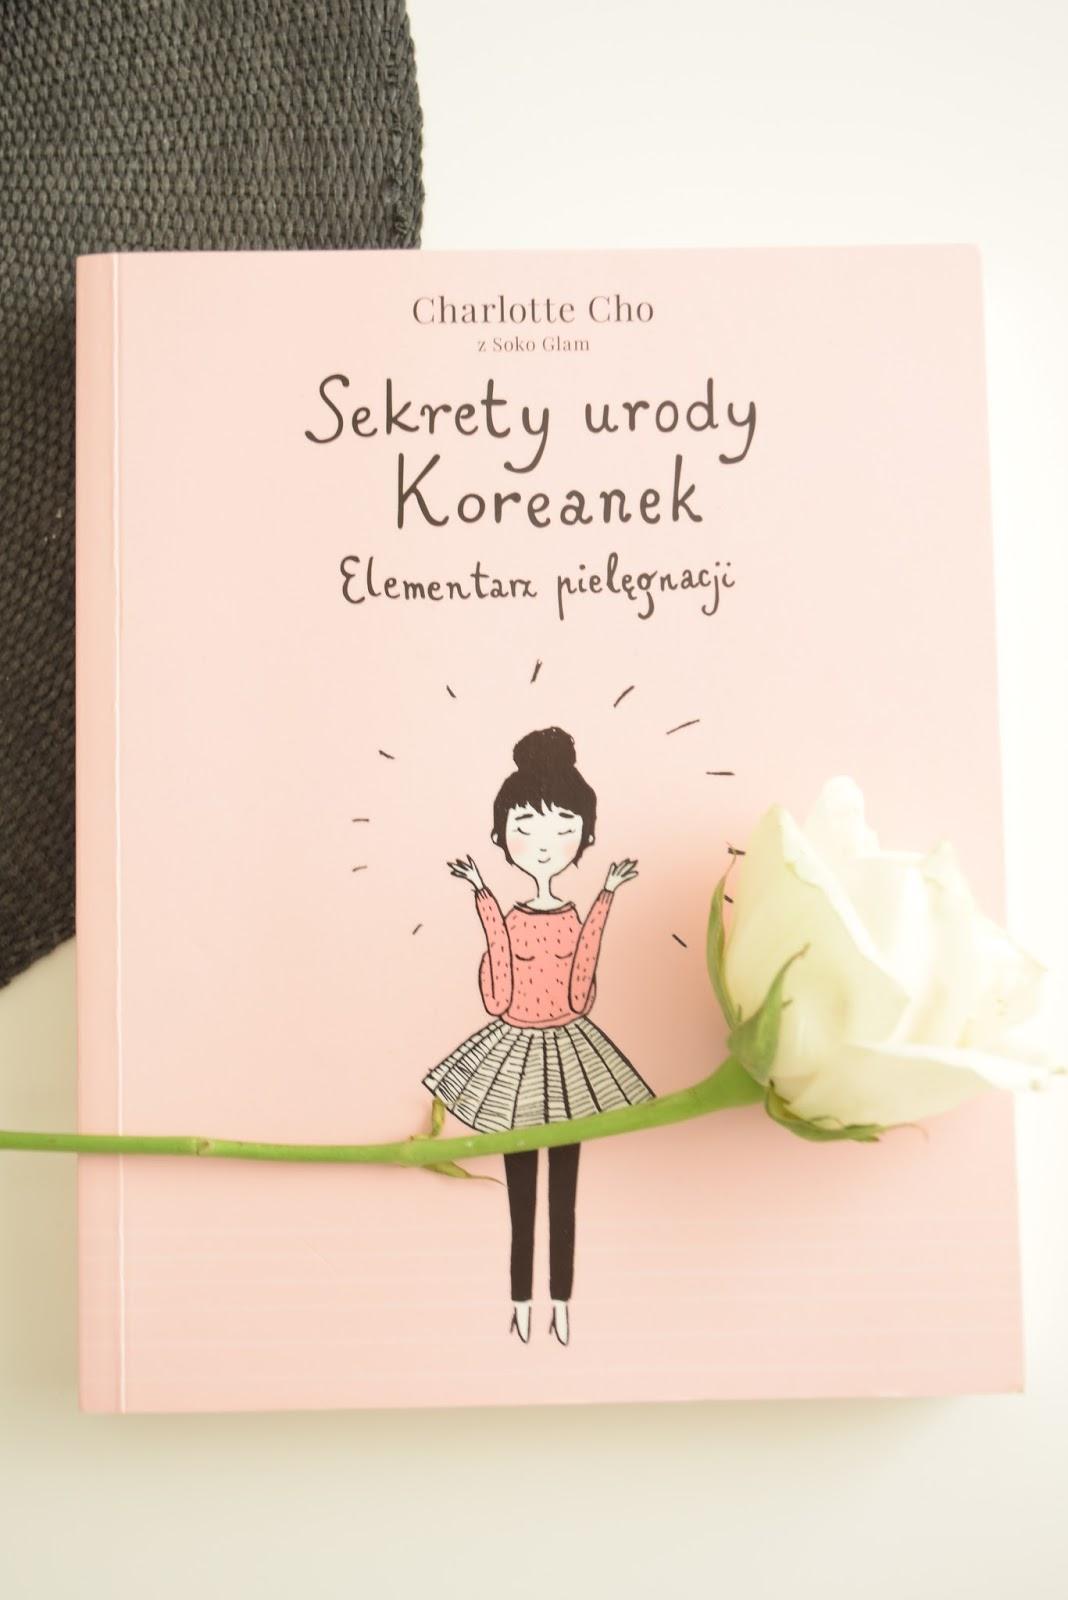 Sekrety urody Koreanek - Elementarz pięlegnacji